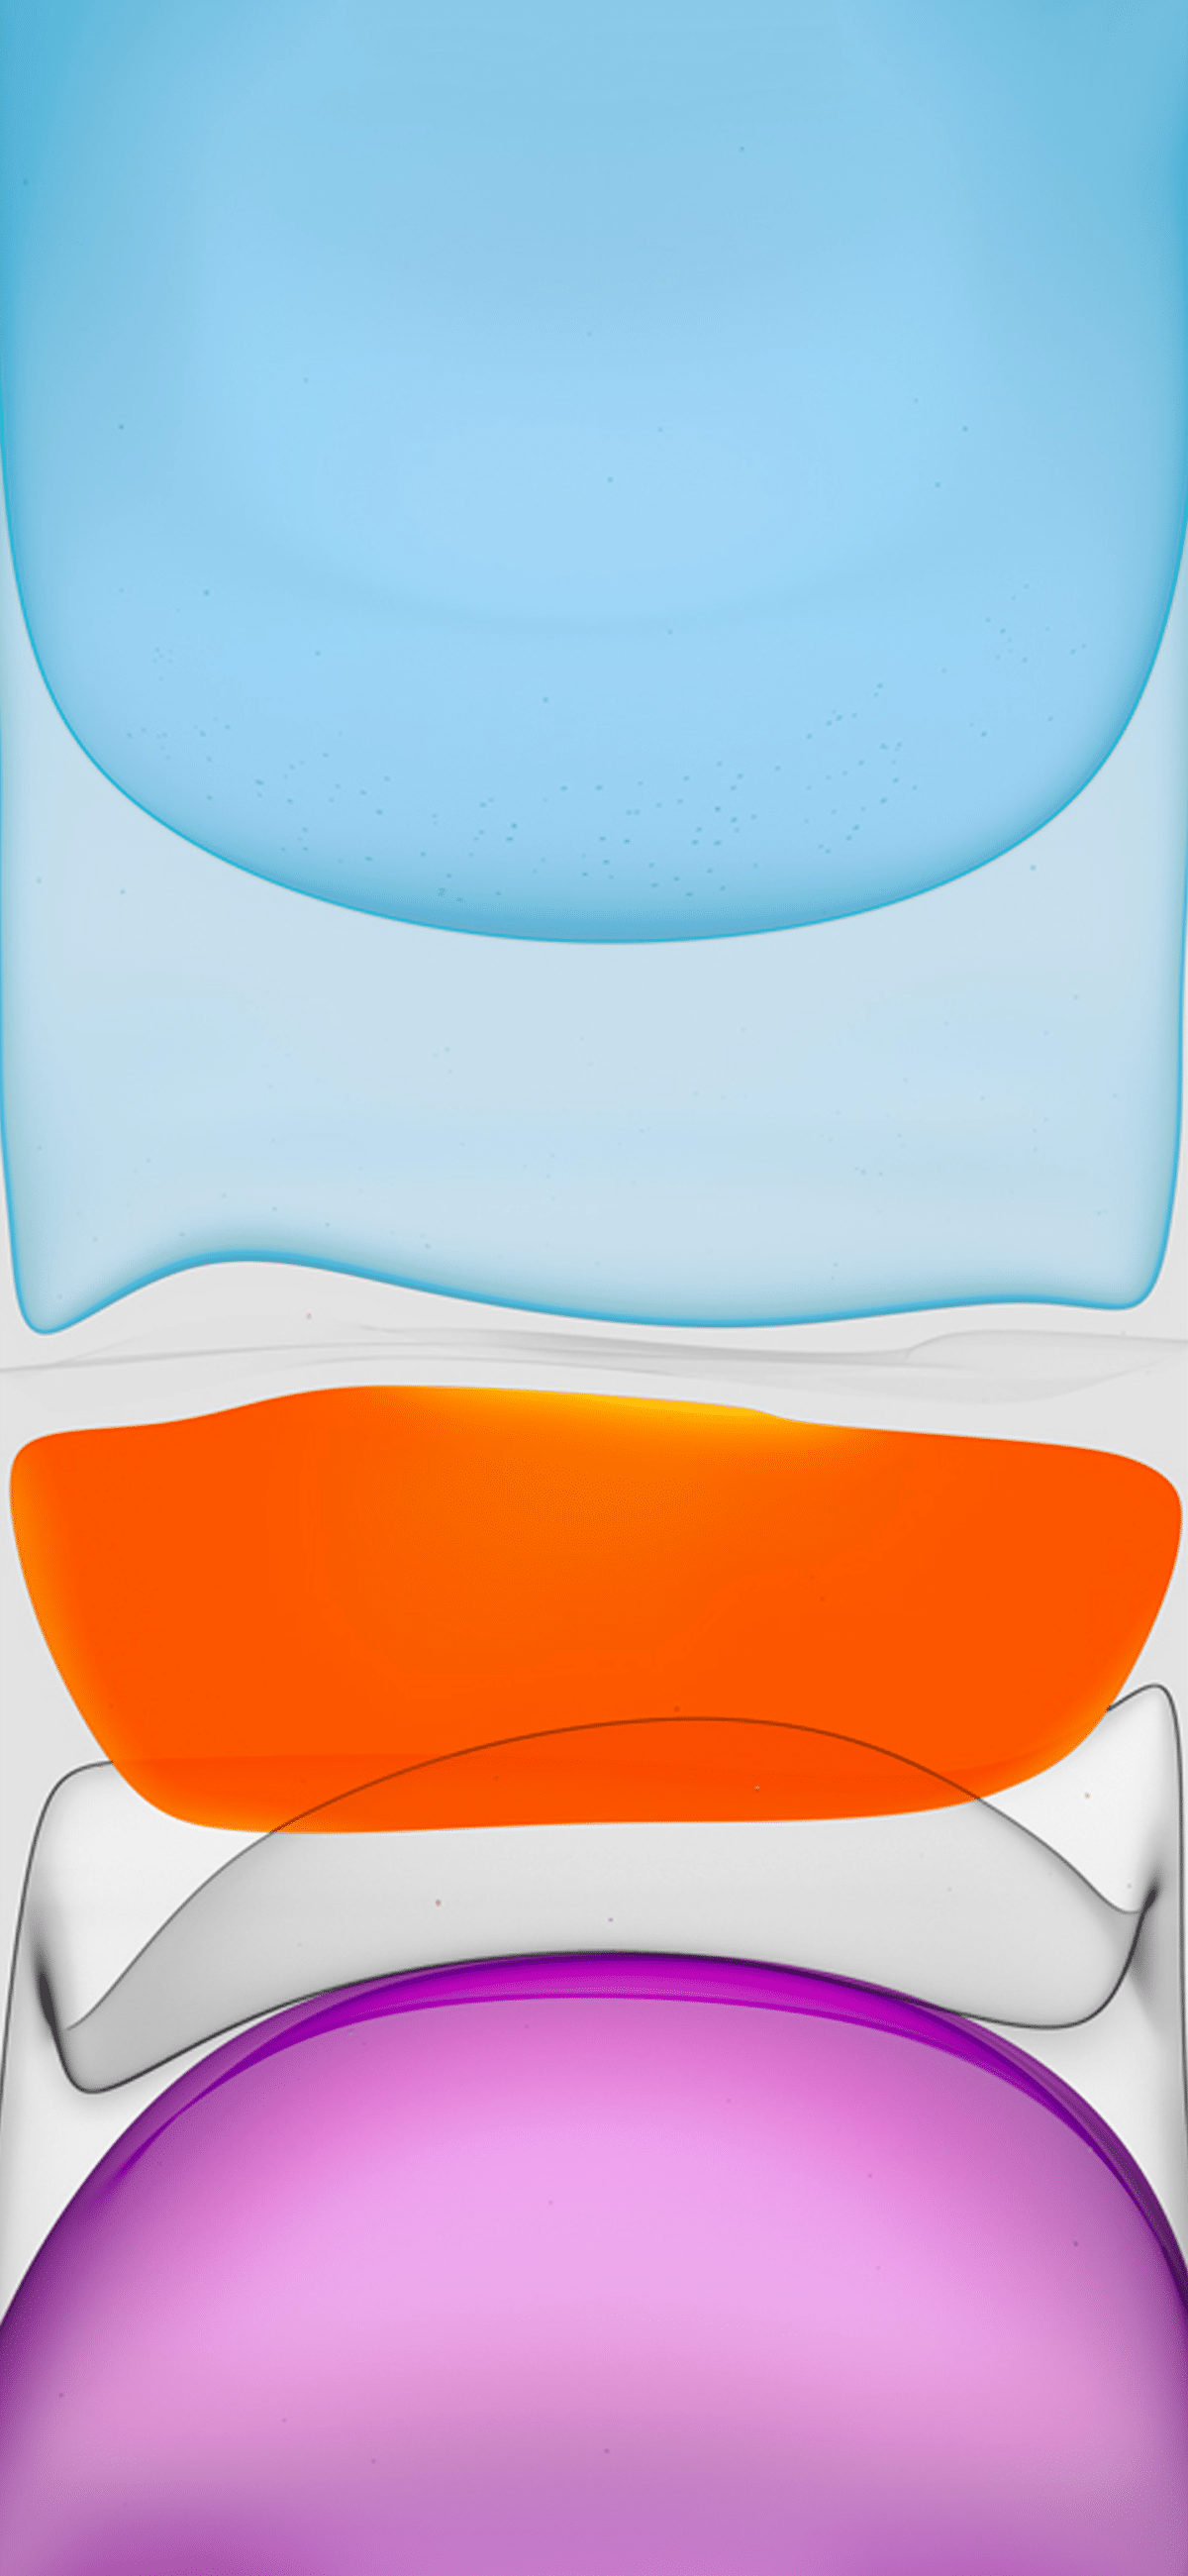 54+ iPhone 11 Wallpapers on WallpaperSafari